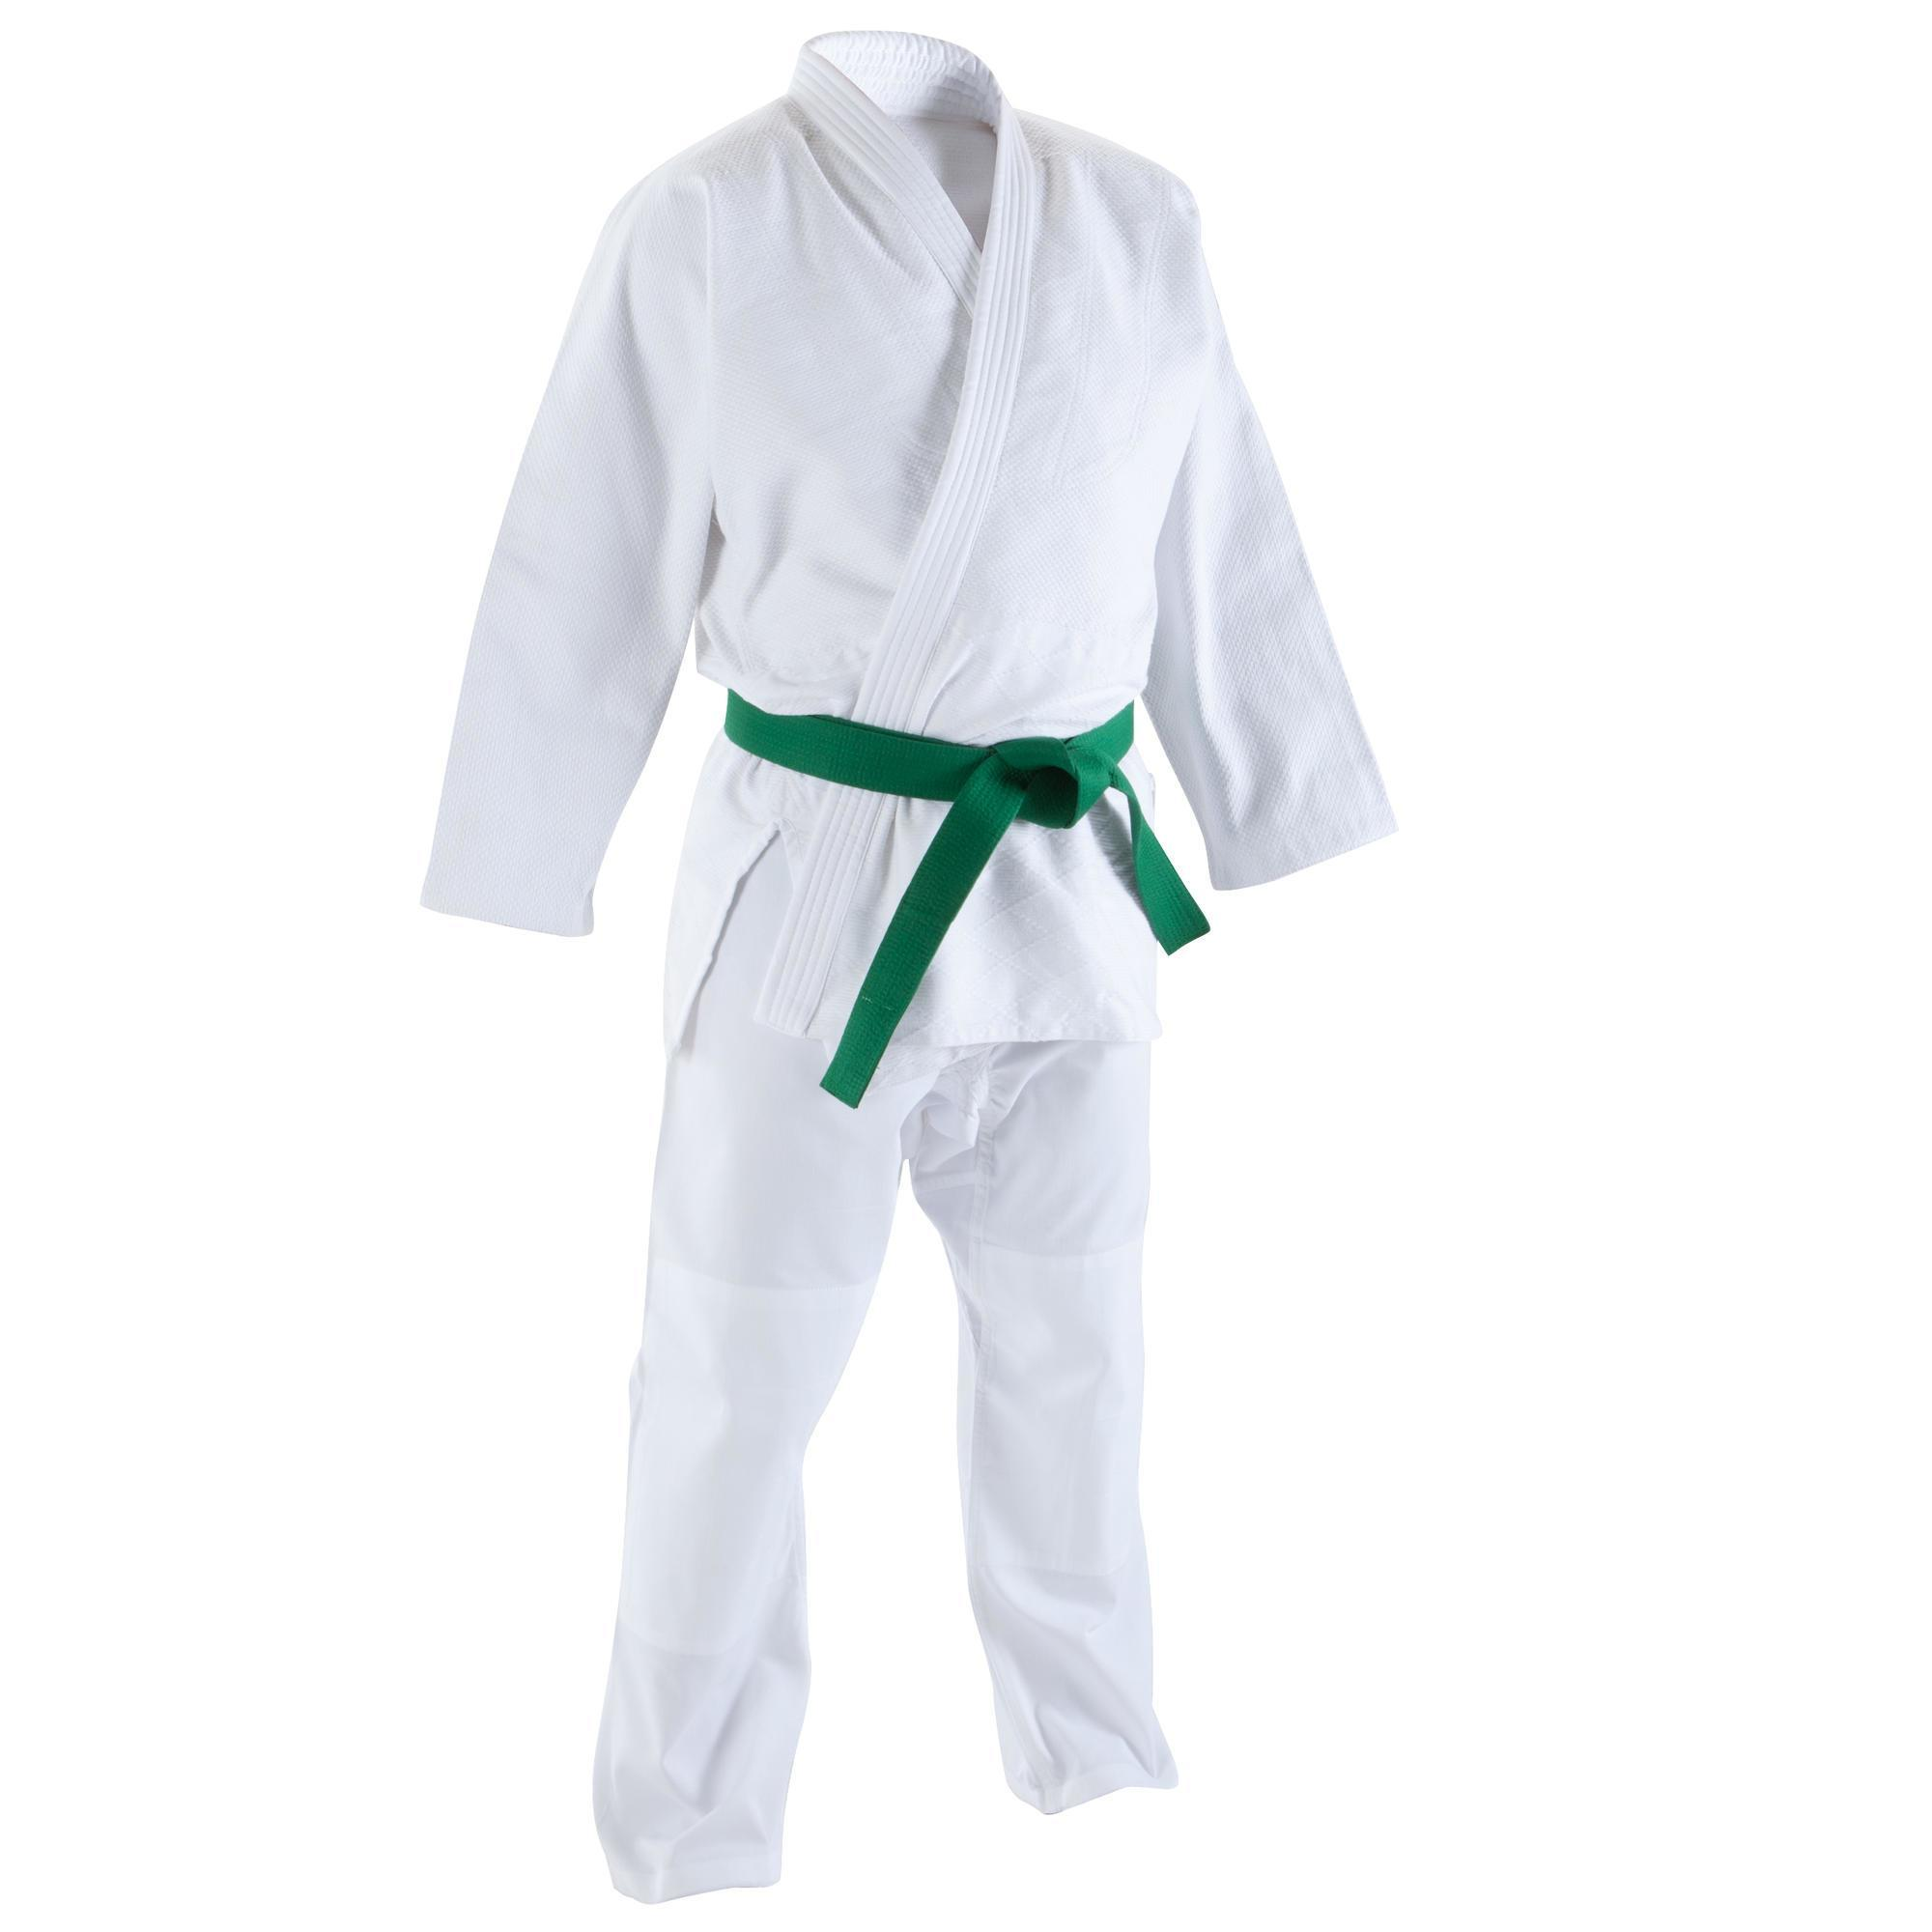 Domyos Judopak 440 volwassenen